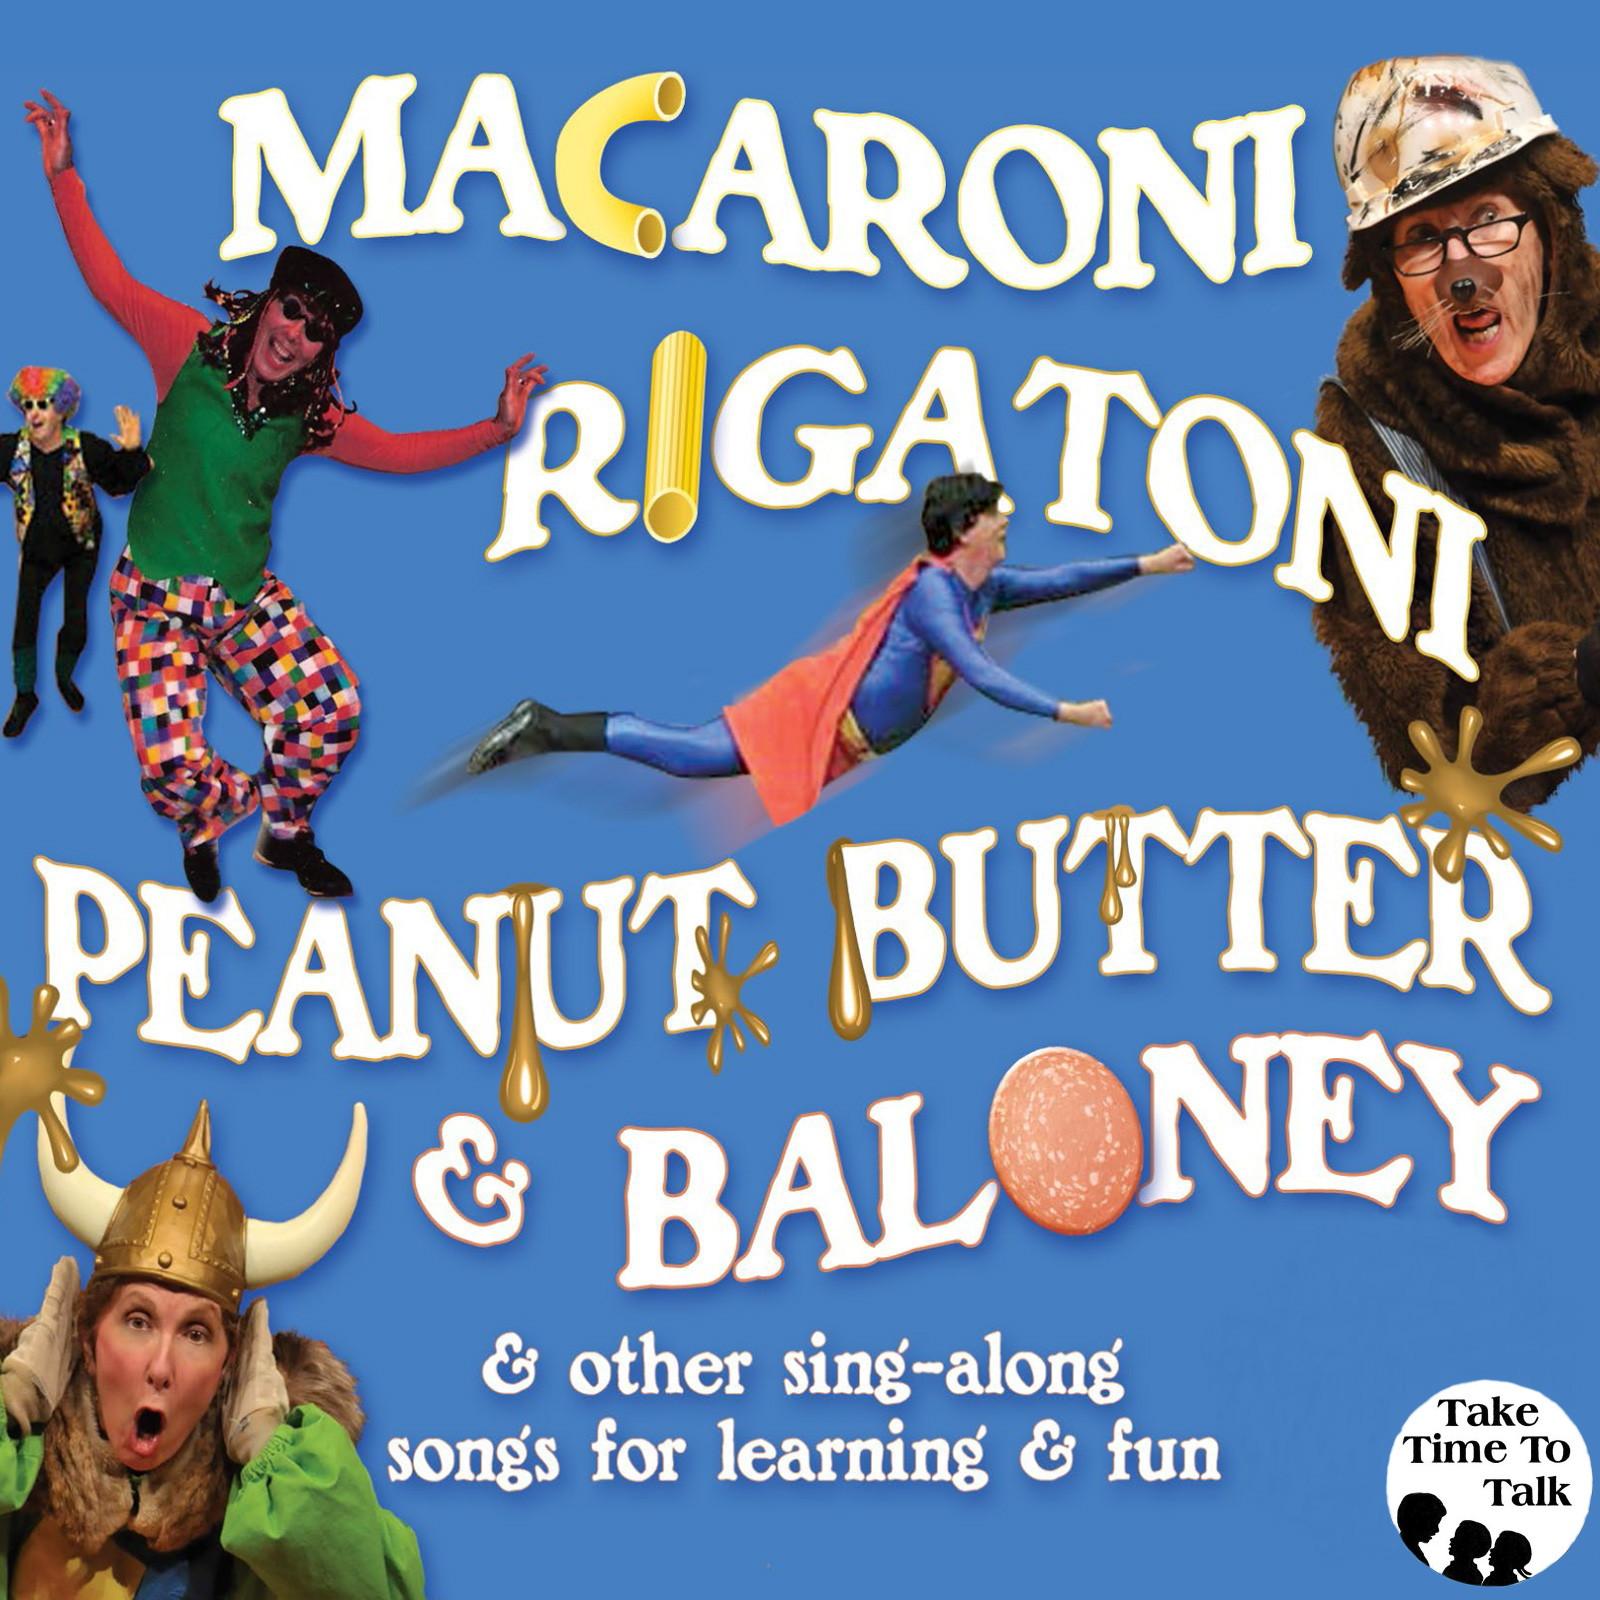 Macaroni Rigatoni